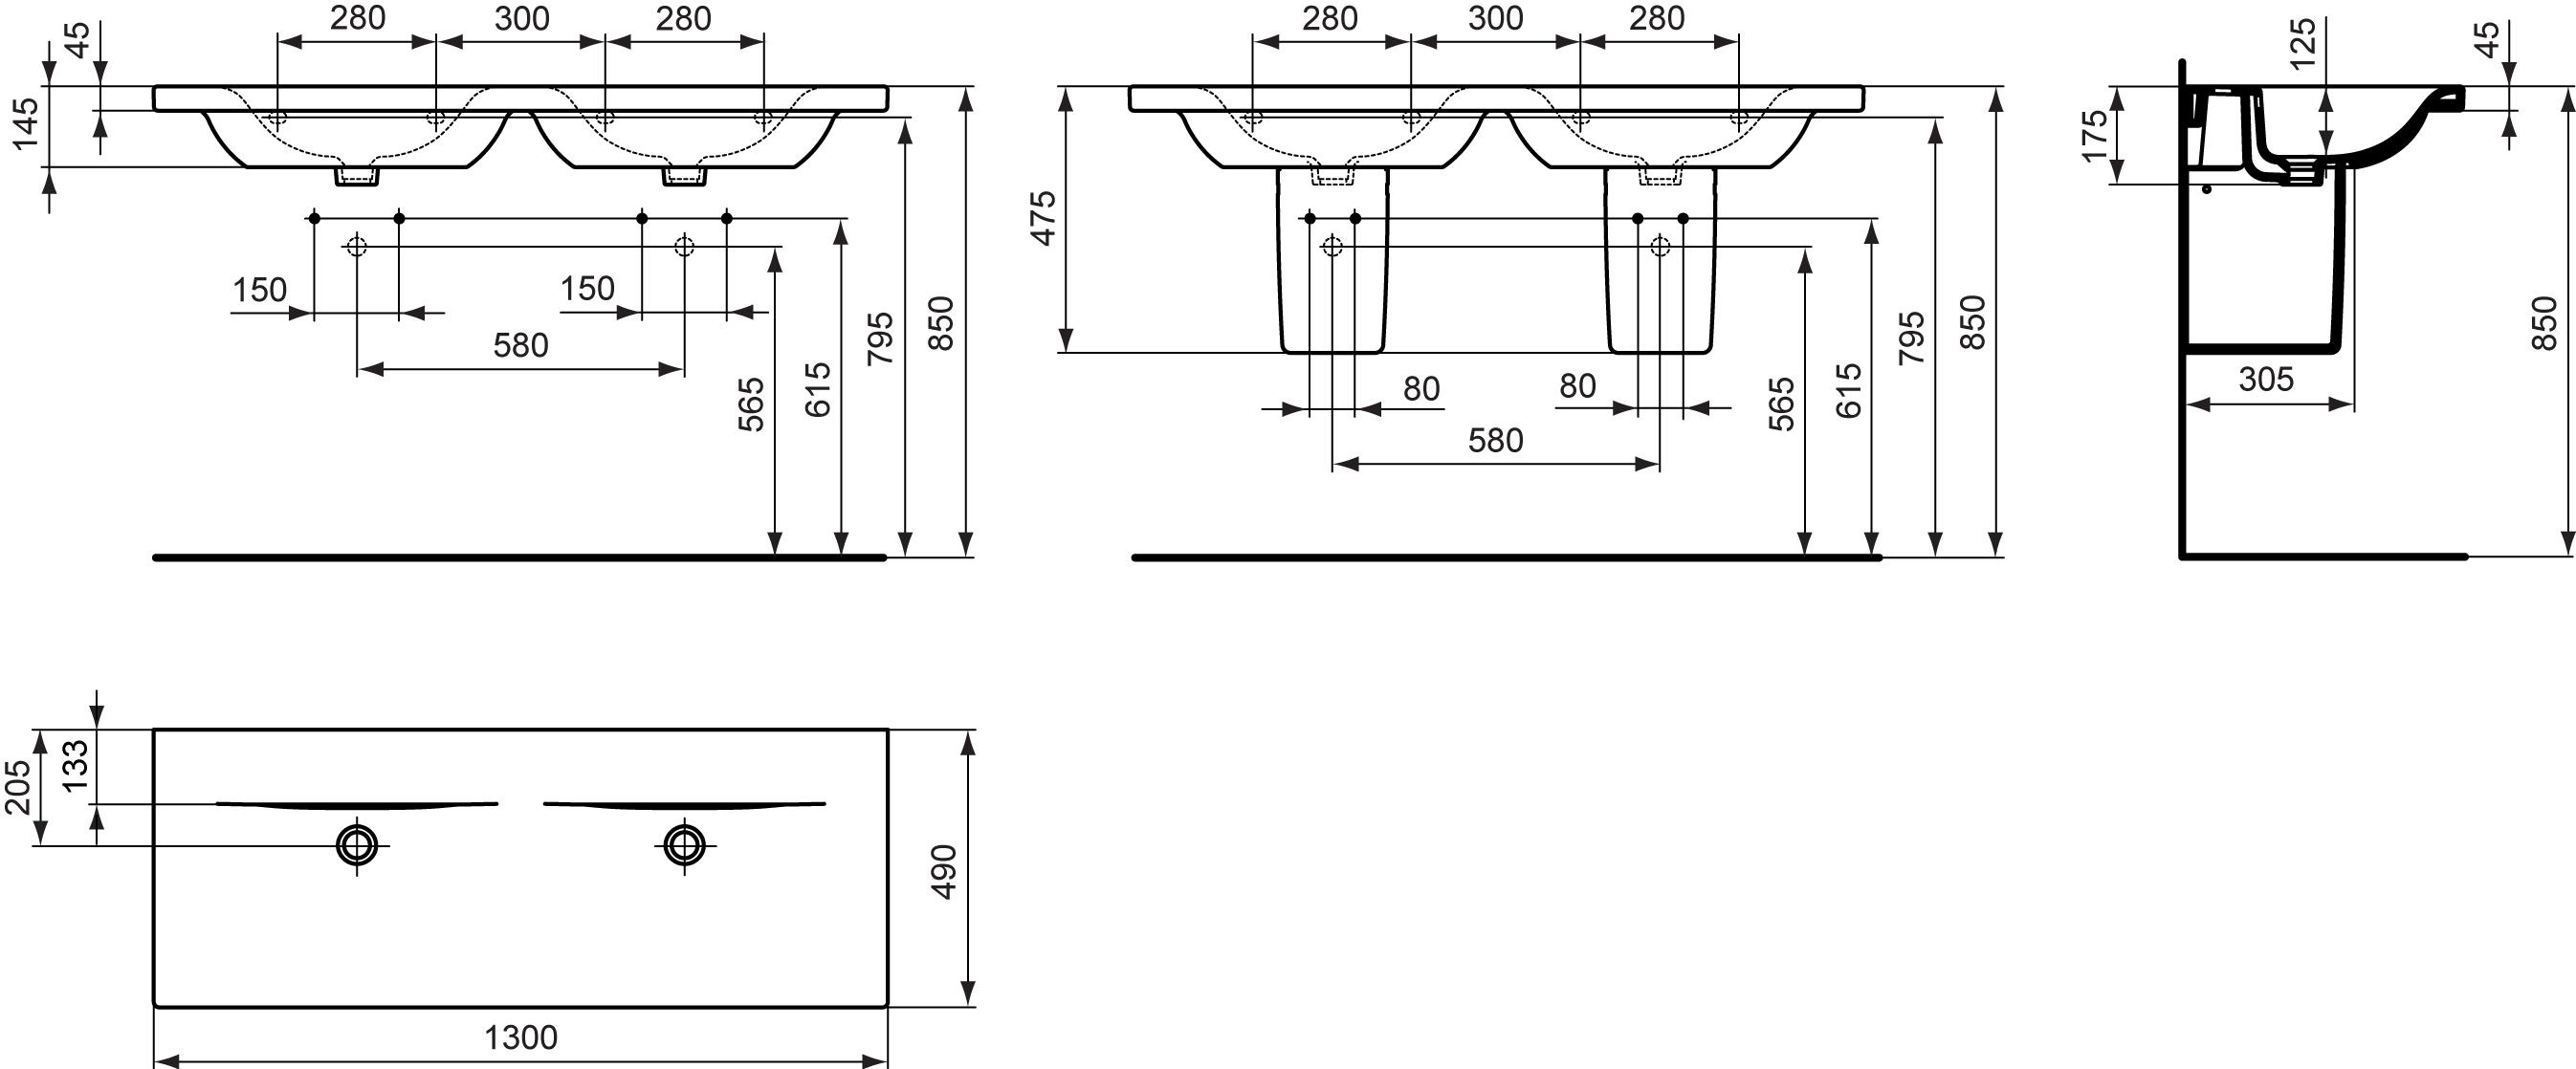 dubbele wastafel 1300 mm zonder kraangaten ideal standard nederland